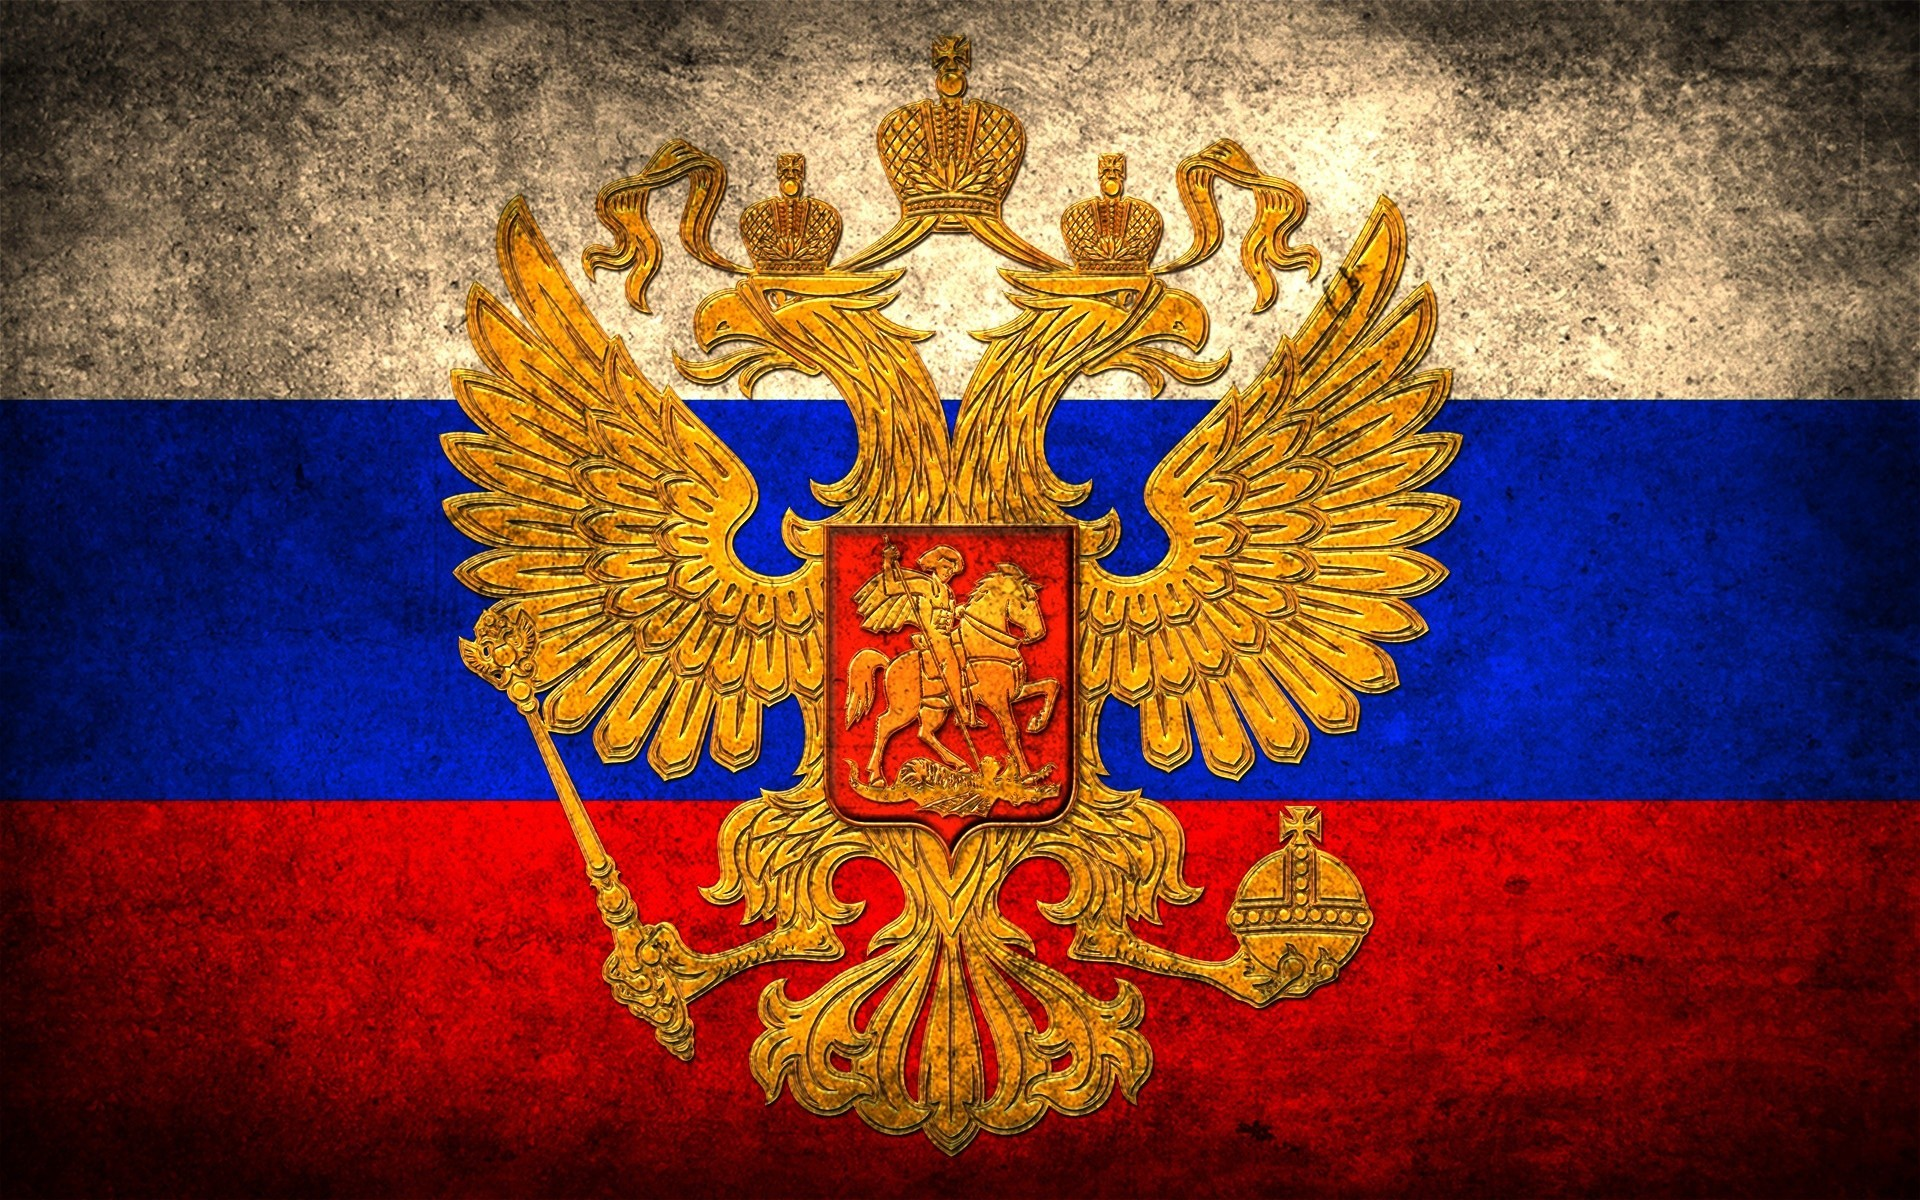 Russian Wallpapers | Top 891 Russian Wallpapers